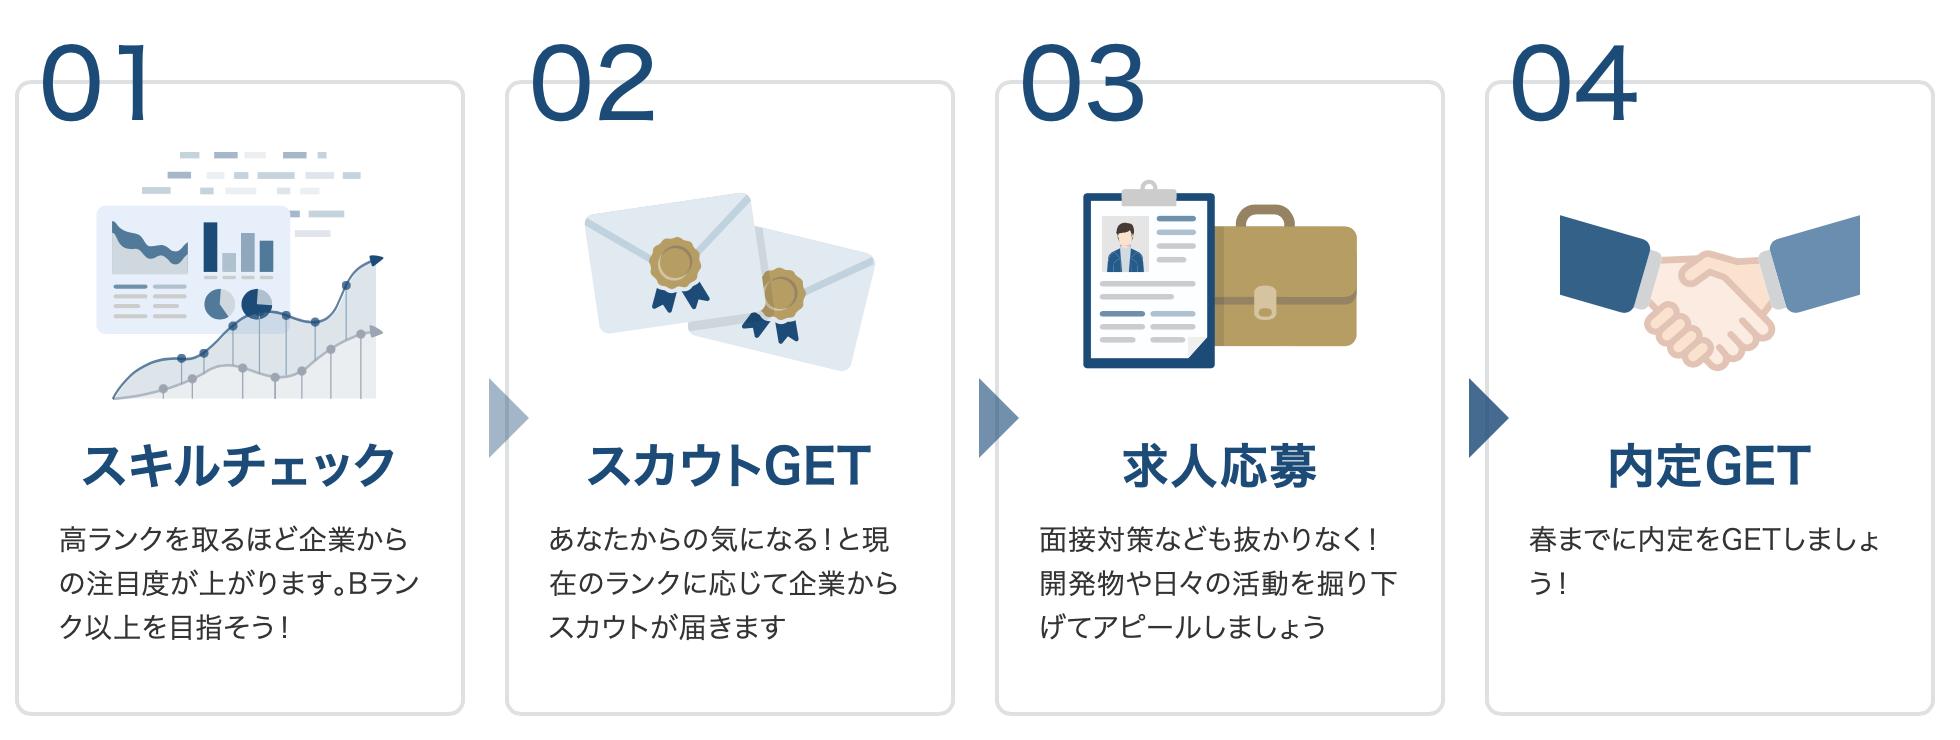 STEP1 スキルチェック → STEP2 スカウトGET → STEP3 求人応募 → STEP4 内定GET